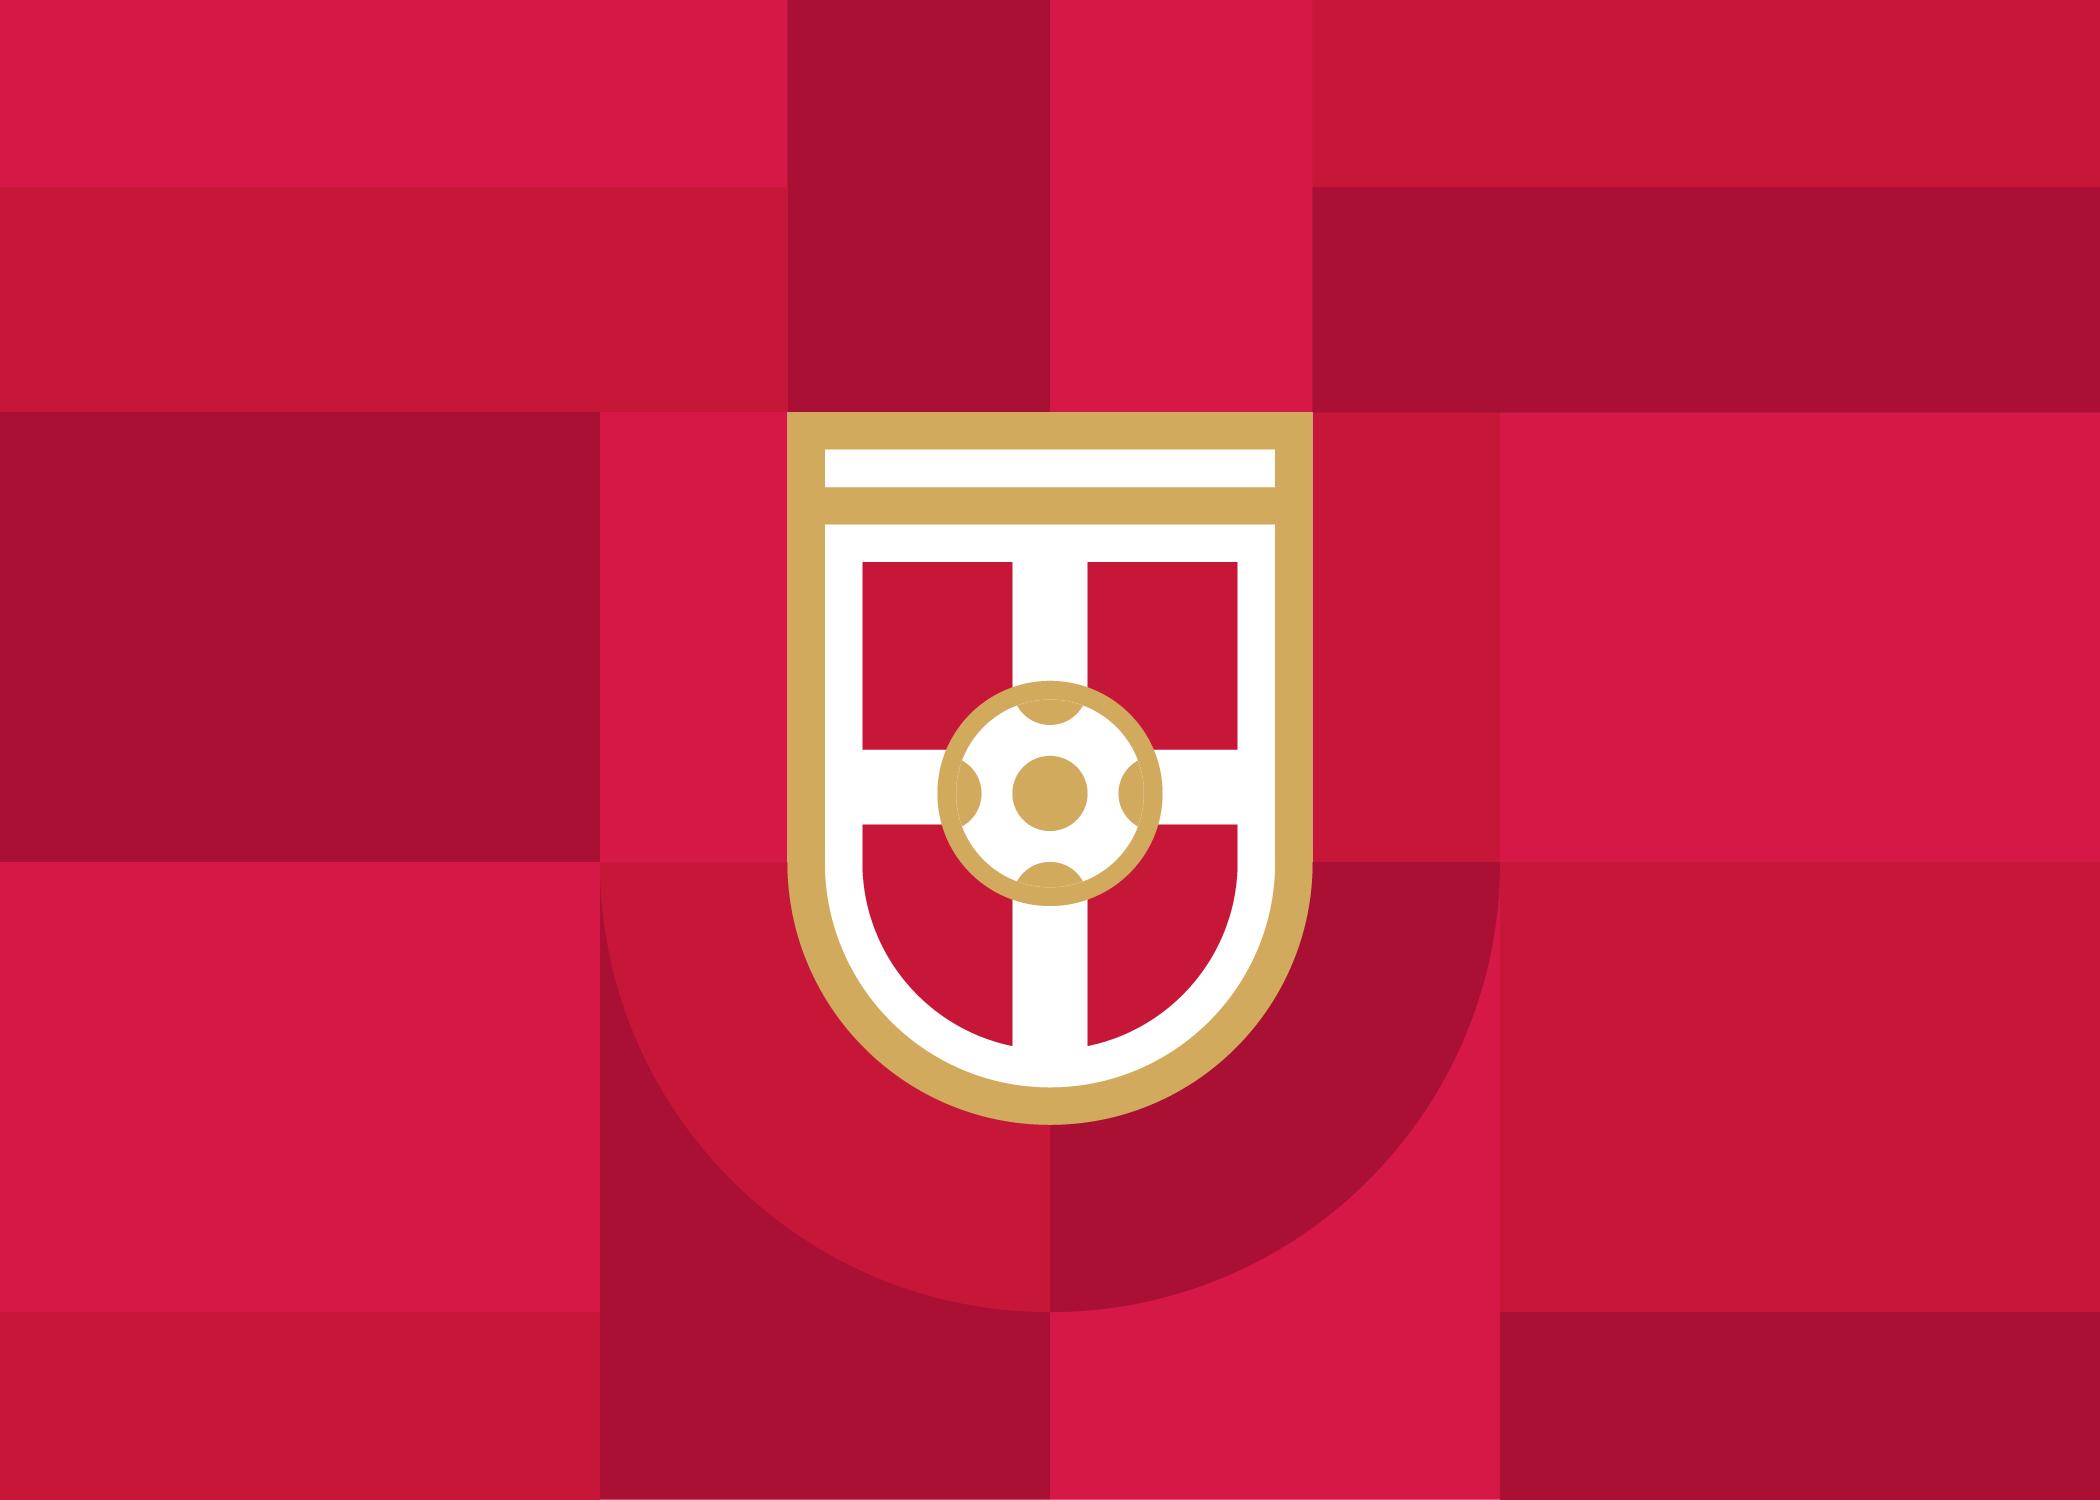 Serbia-Geometric-World-Cup-Football-Badge-01-Logo-Design-Freelance-Kent.png